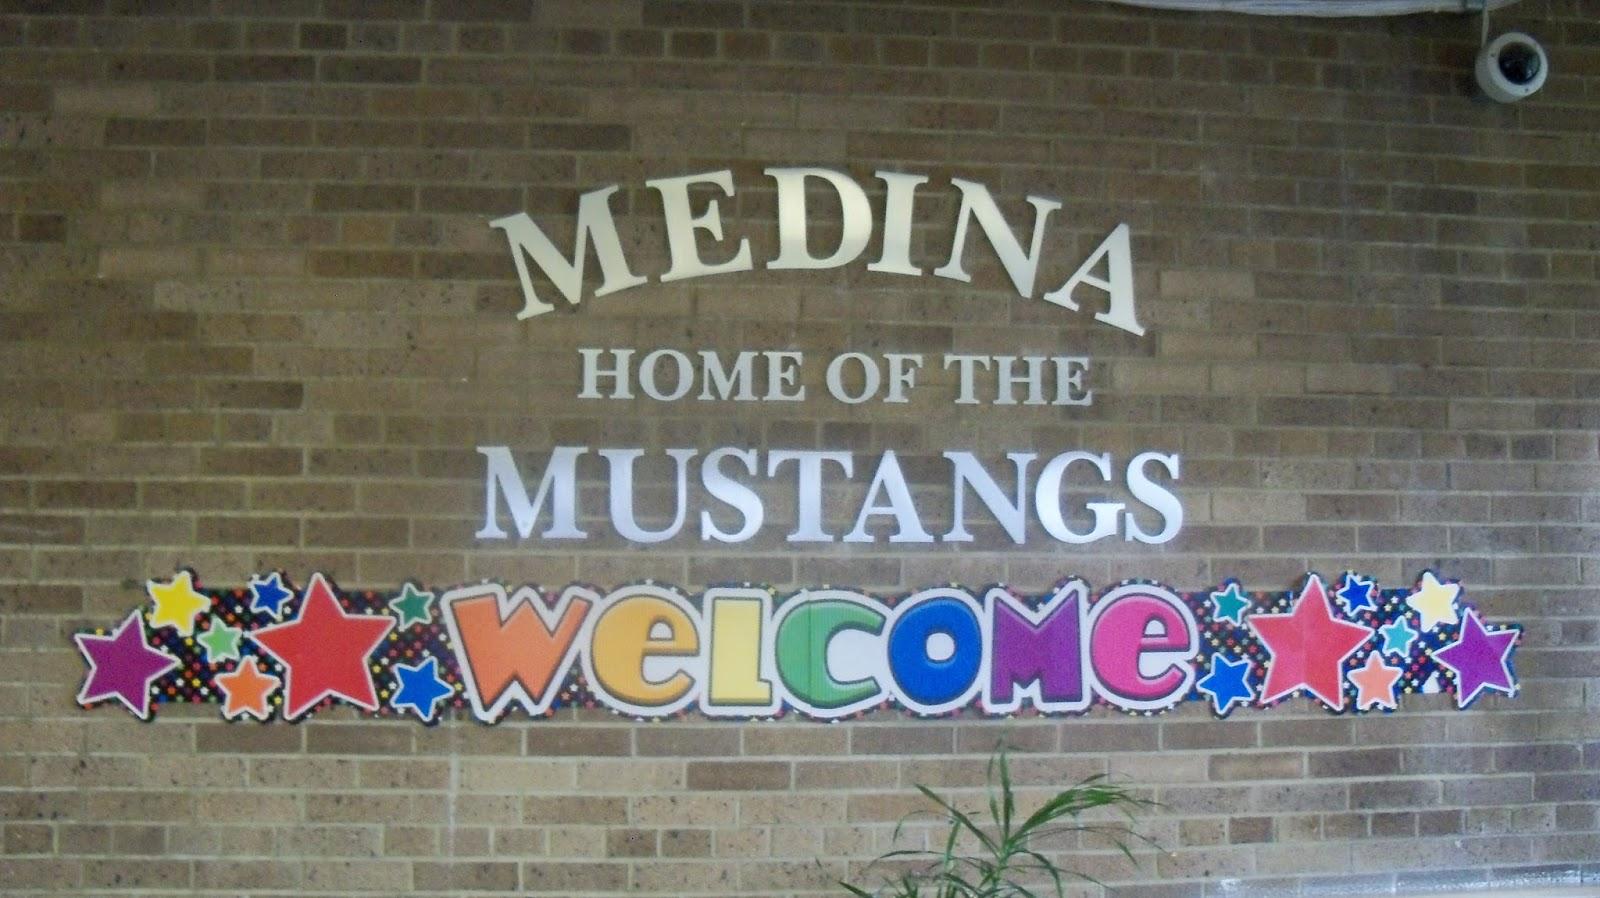 Medina Middle School / Homepage